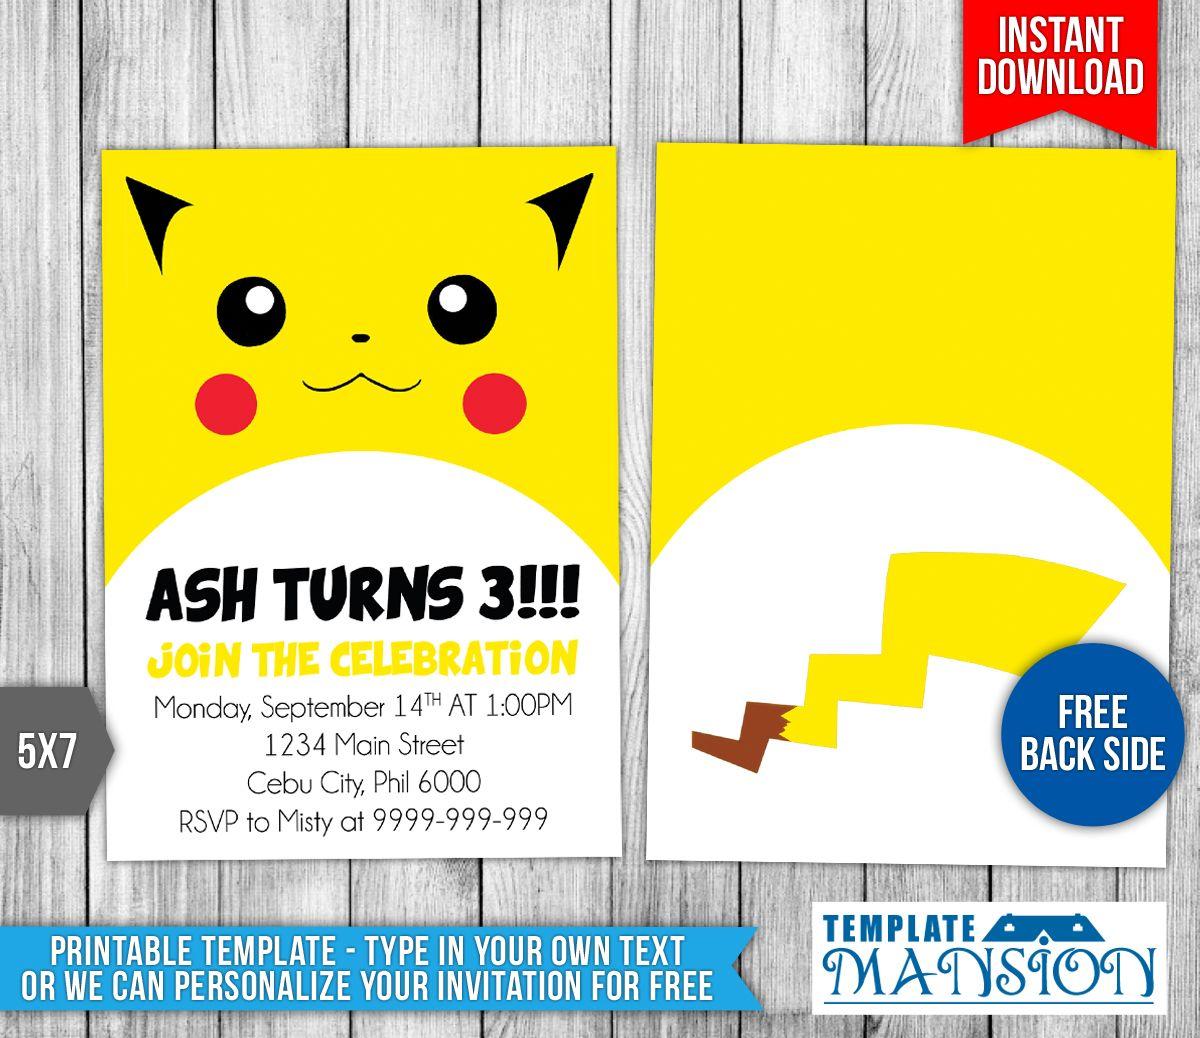 Pikachu Pokemon Birthday Invitation Template By Templatemansion On Pokemon Invitations Pokemon Party Invitations Birthday Invitation Templates